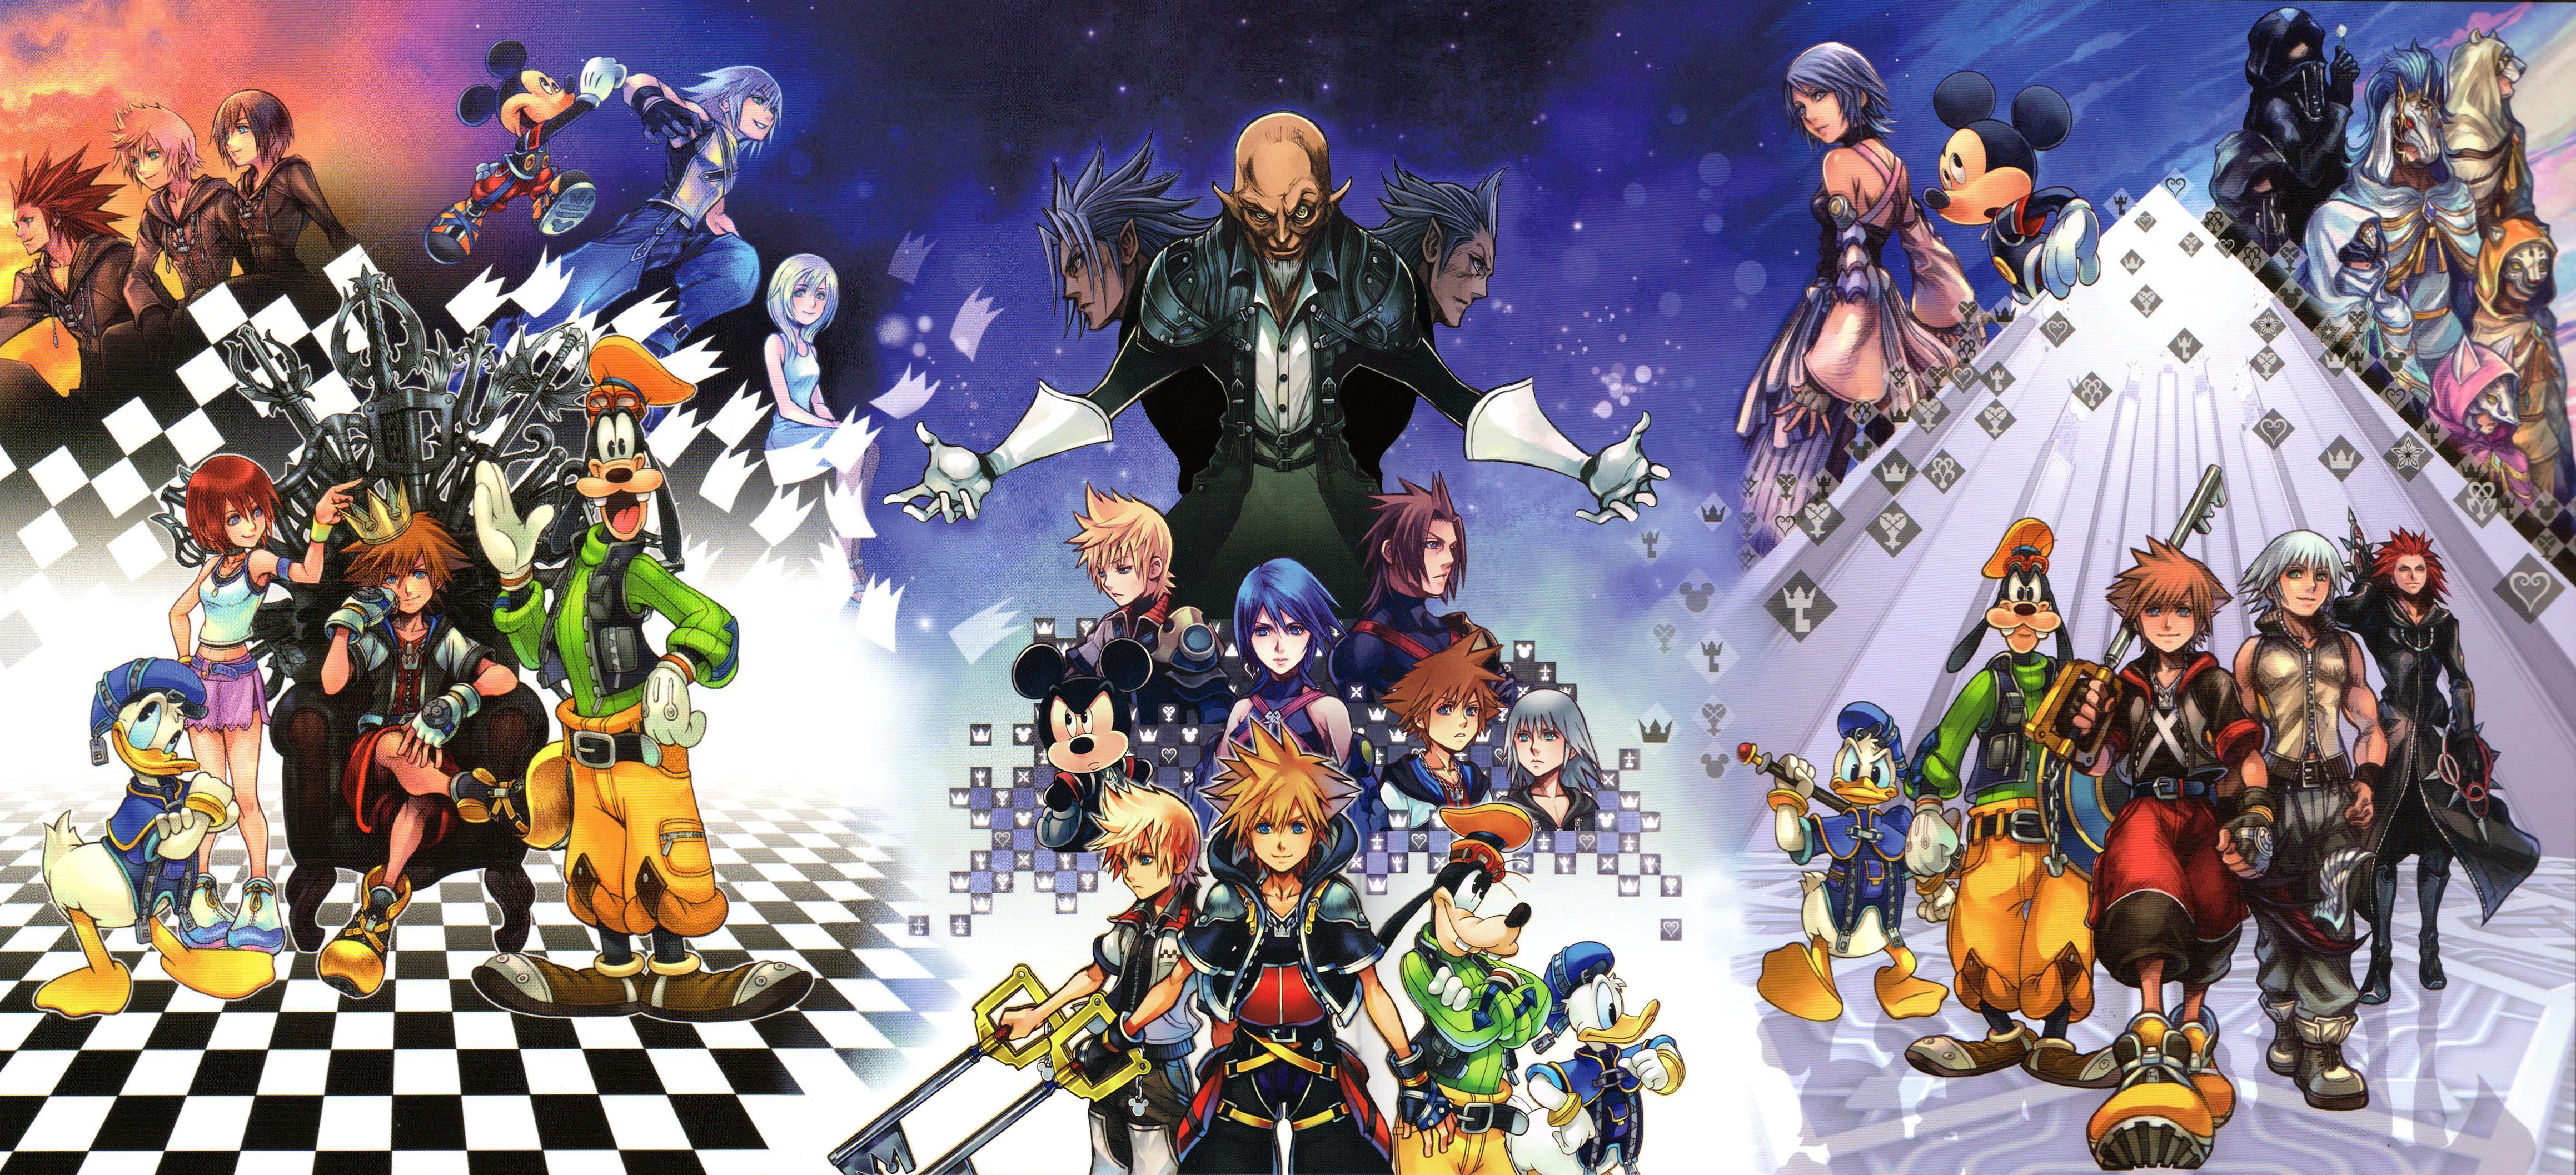 Kingdom Hearts 2018 Wallpapers - Wallpaper Cave